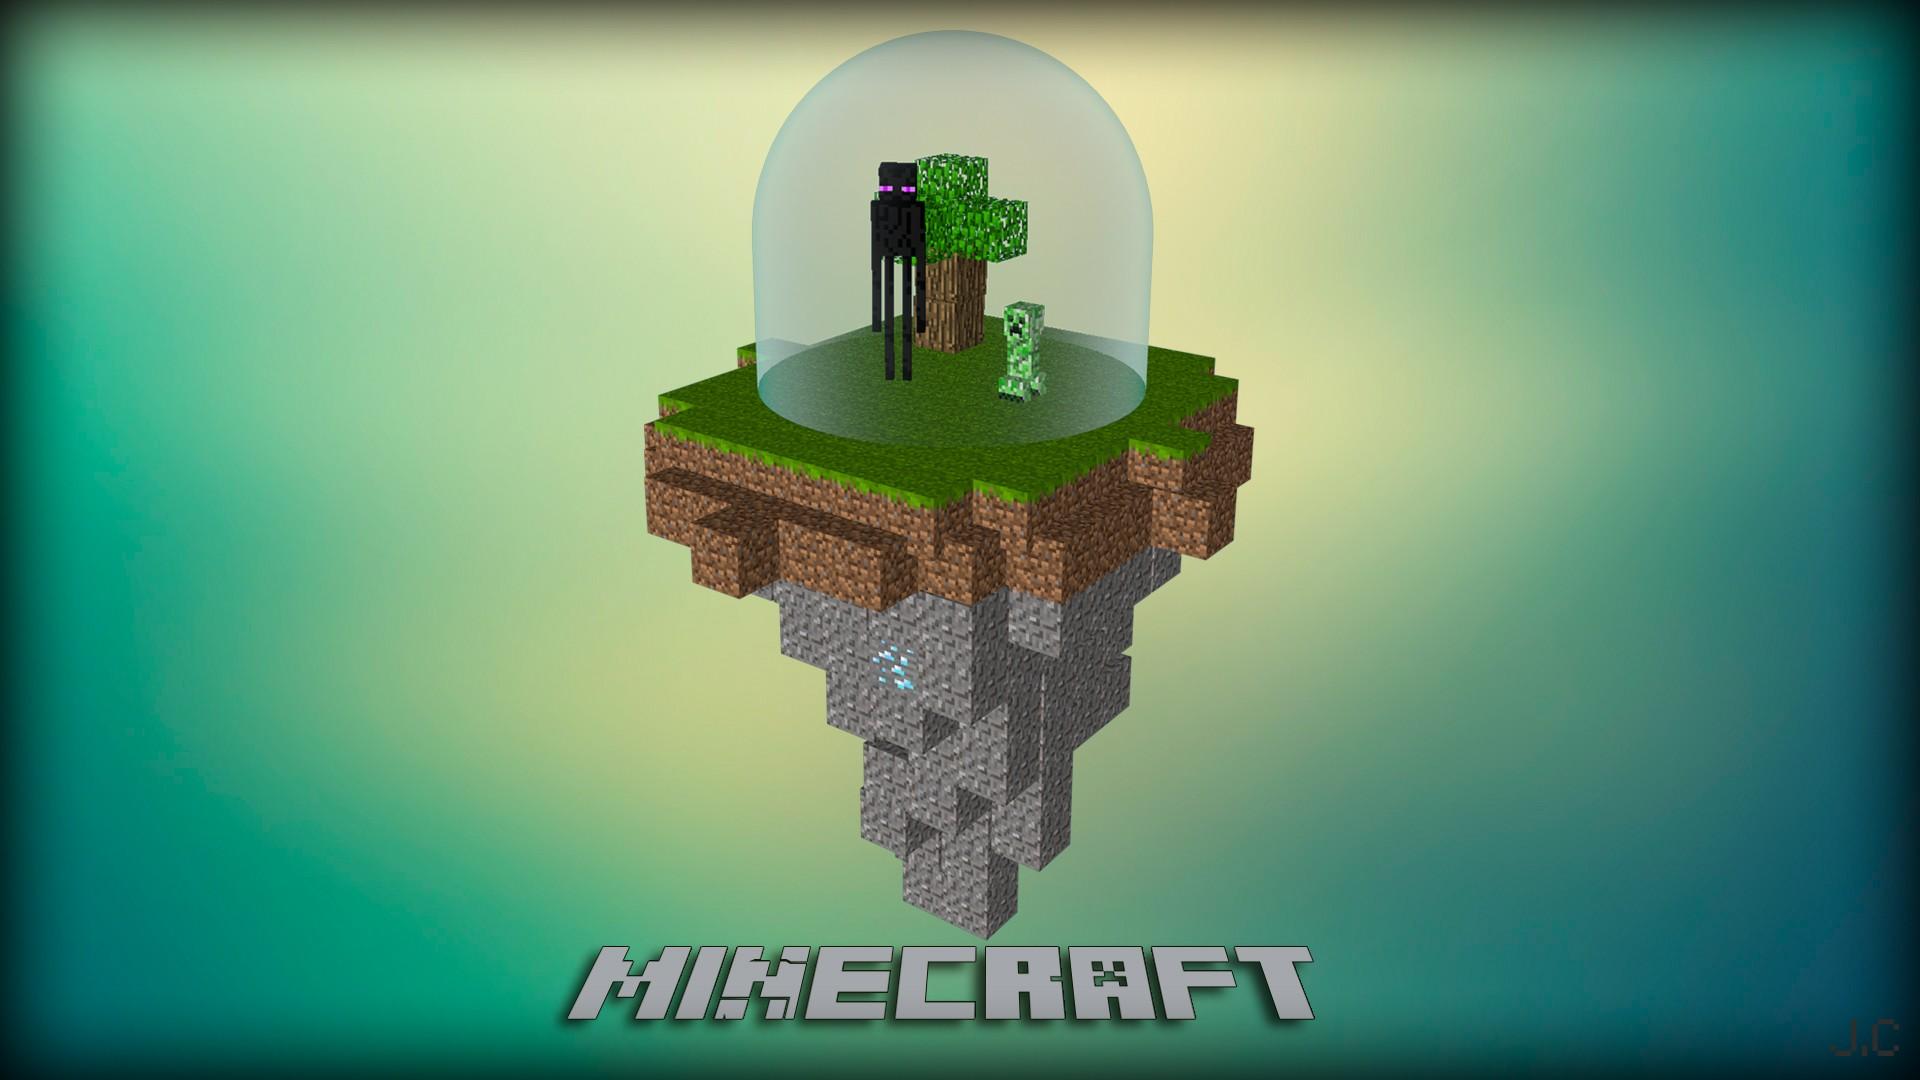 Popular Wallpaper Minecraft Enderman - 967002040b3b236170acc8c0ca45a1ba  Pic_45963.jpg